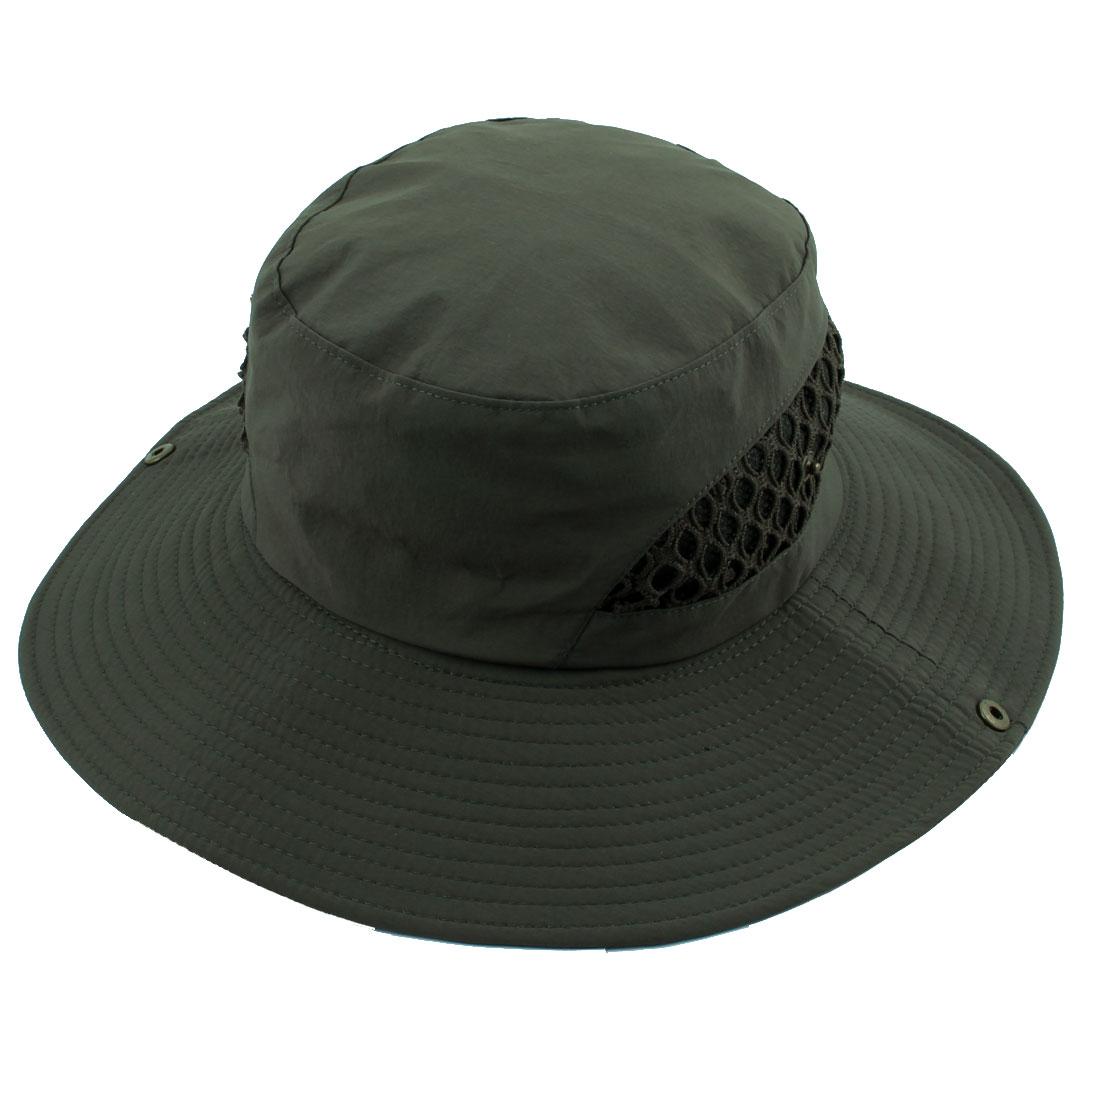 Fisherman Outdoor Fishing Hiking Travel Climbing Hunting Mesh Wide Brim Cap Headwear Sun Bucket Hat Army Green